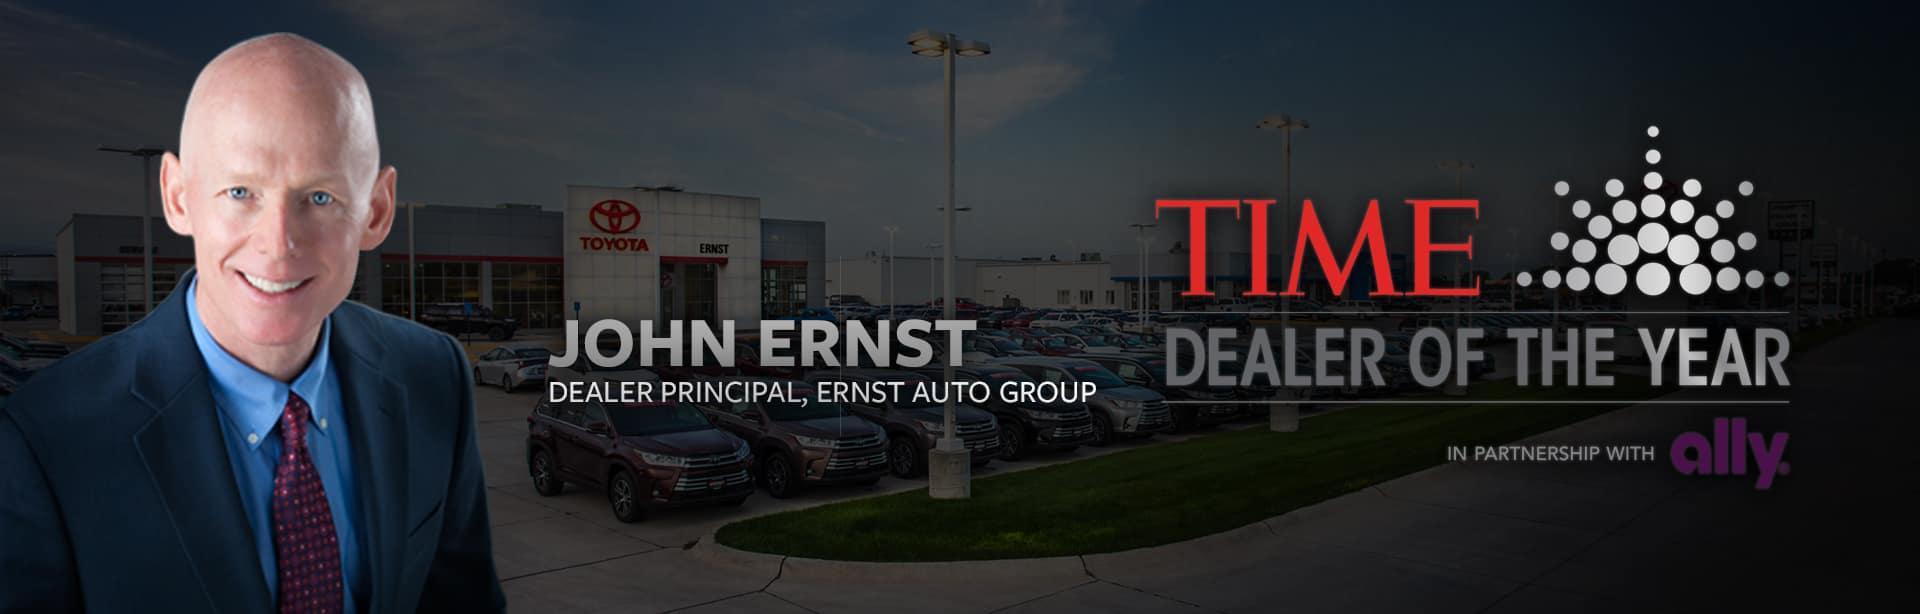 John Ernst, Time Dealer of the Year